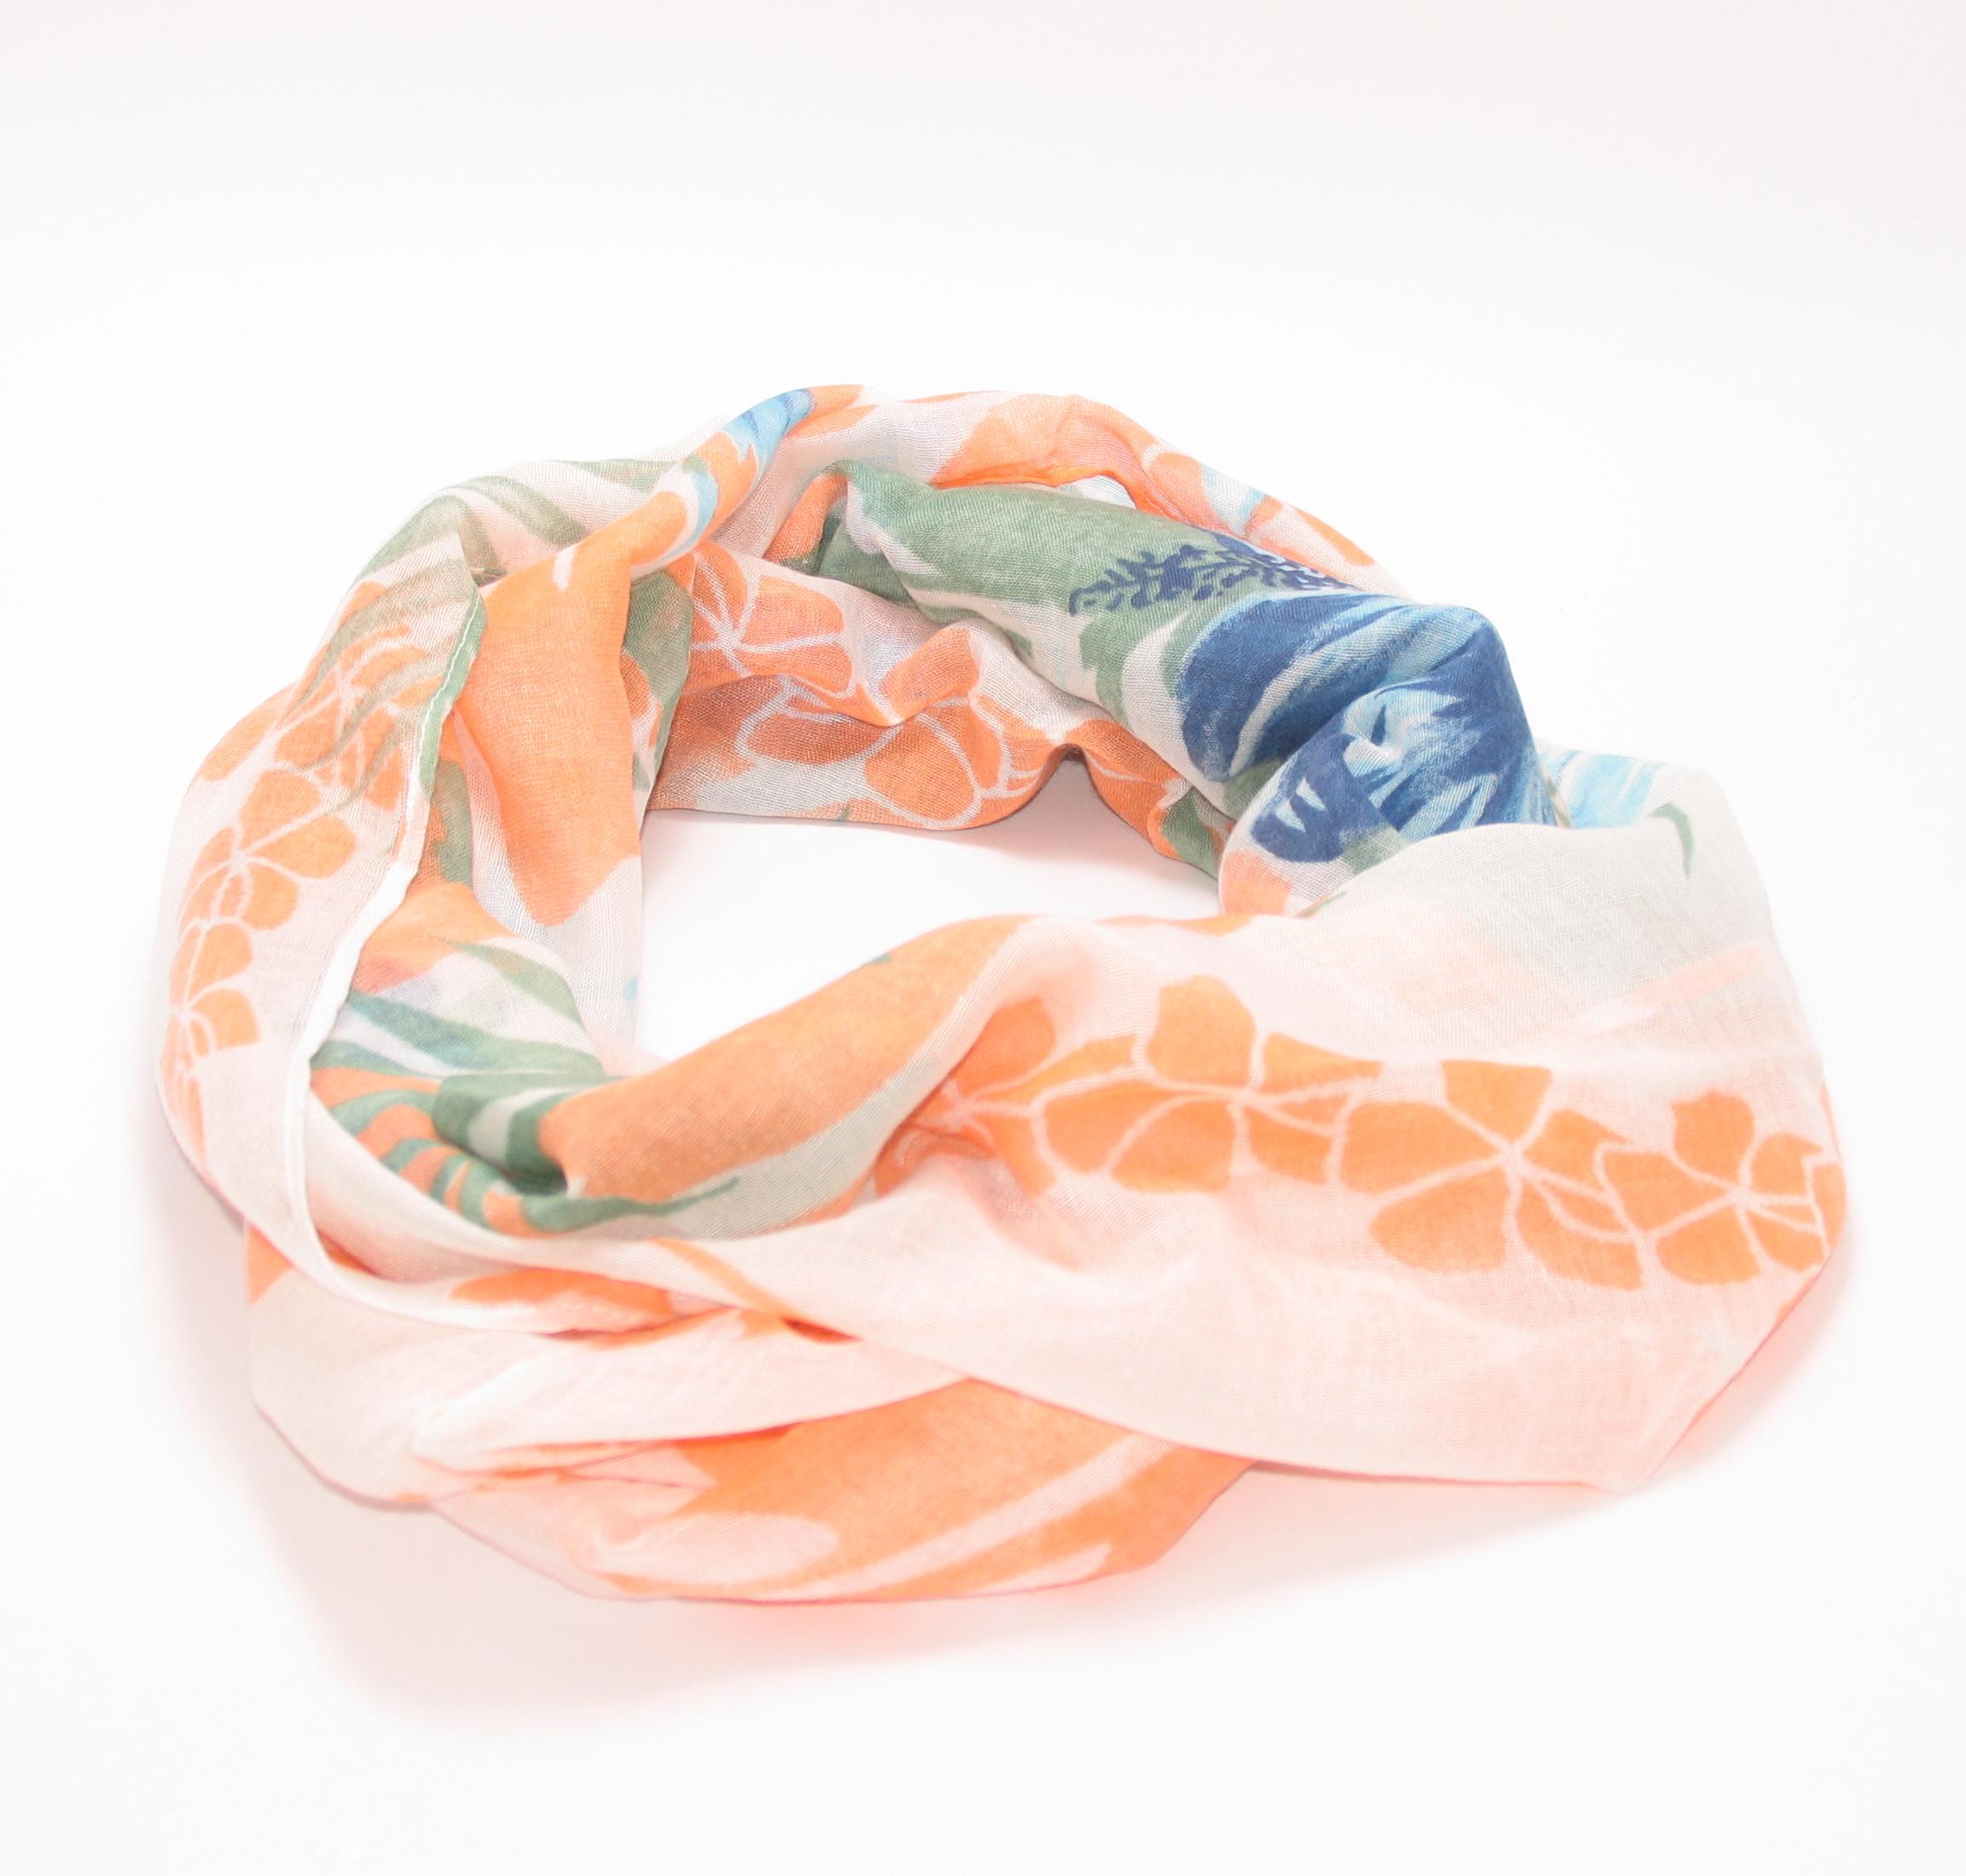 Jordan Jemný šátek tunel - NORDIC různé barvy